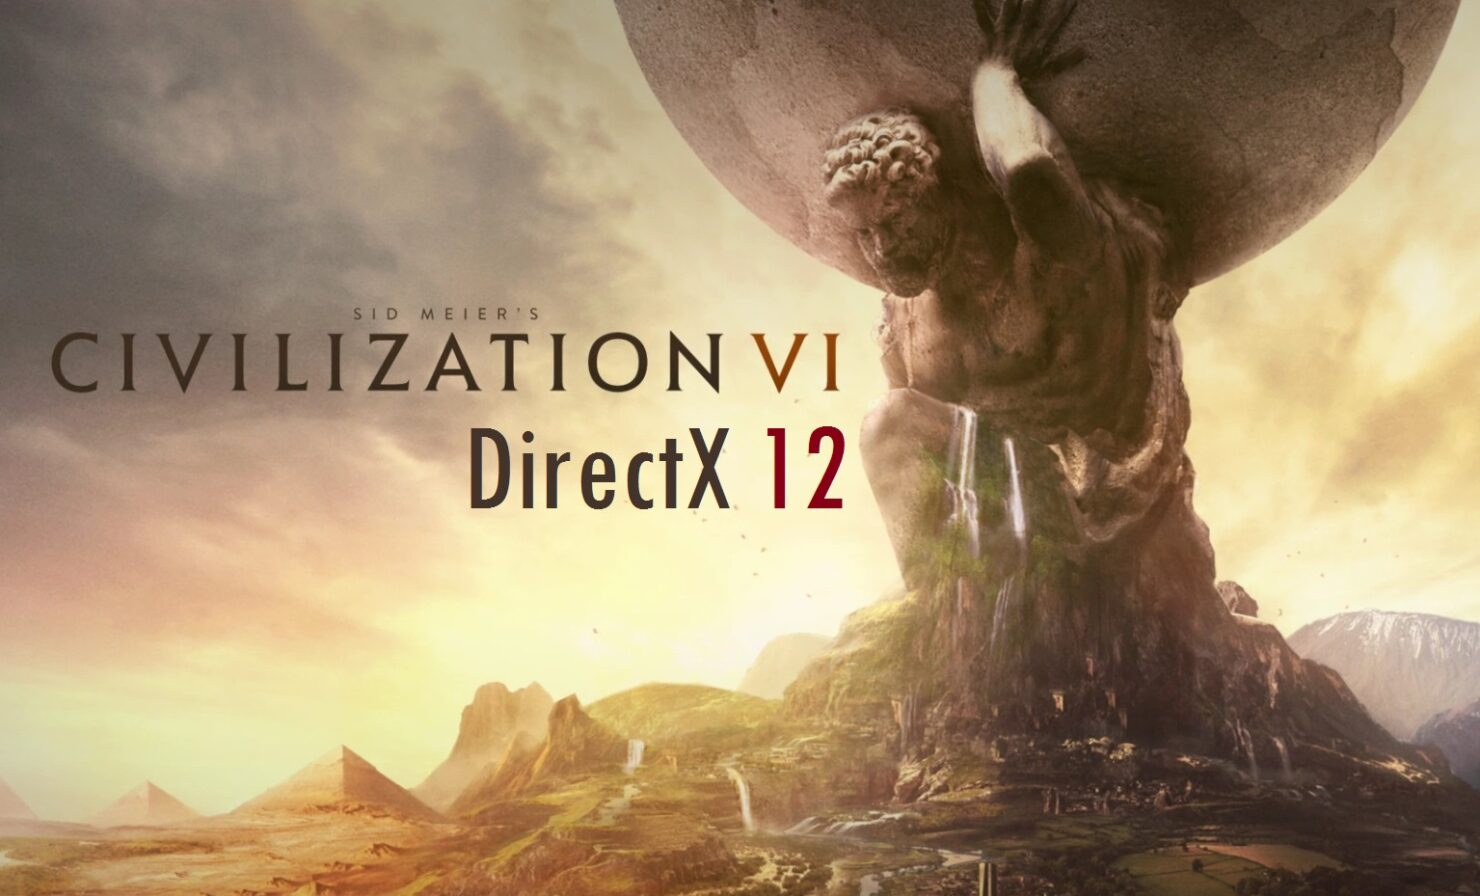 DX12 Civilization VI